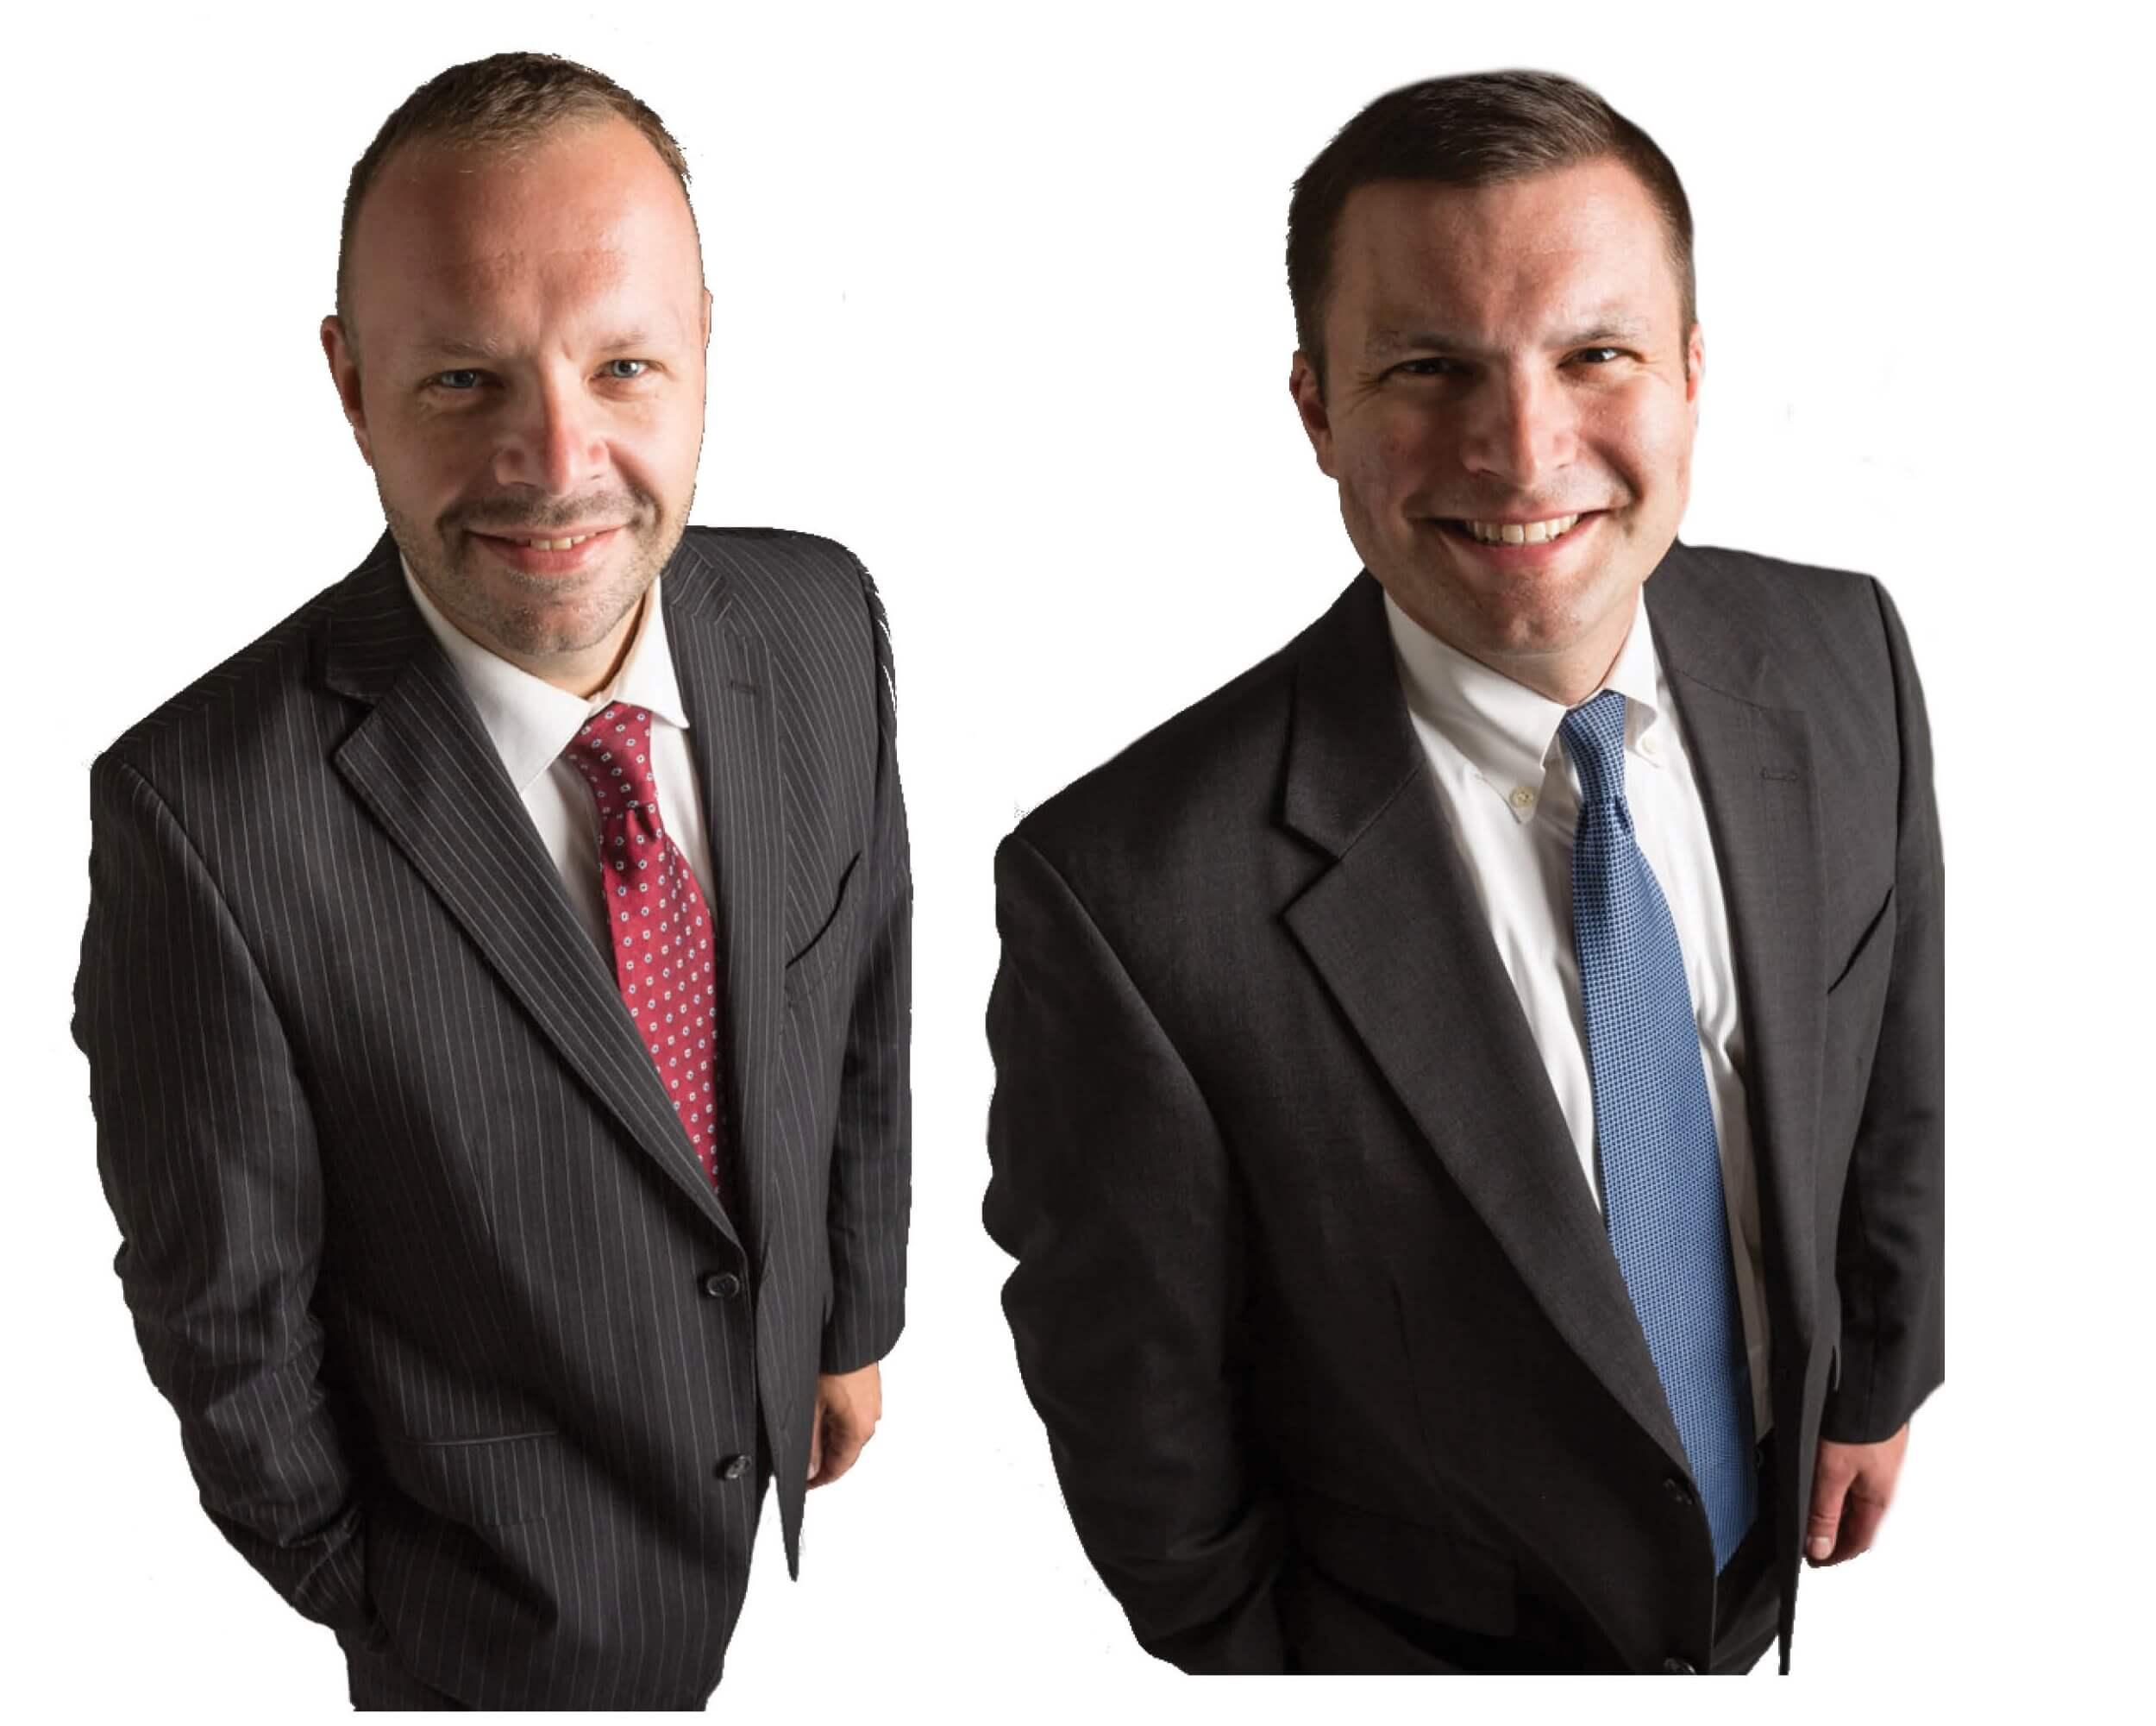 Image: Attorney Pahowka and Attorney Bair